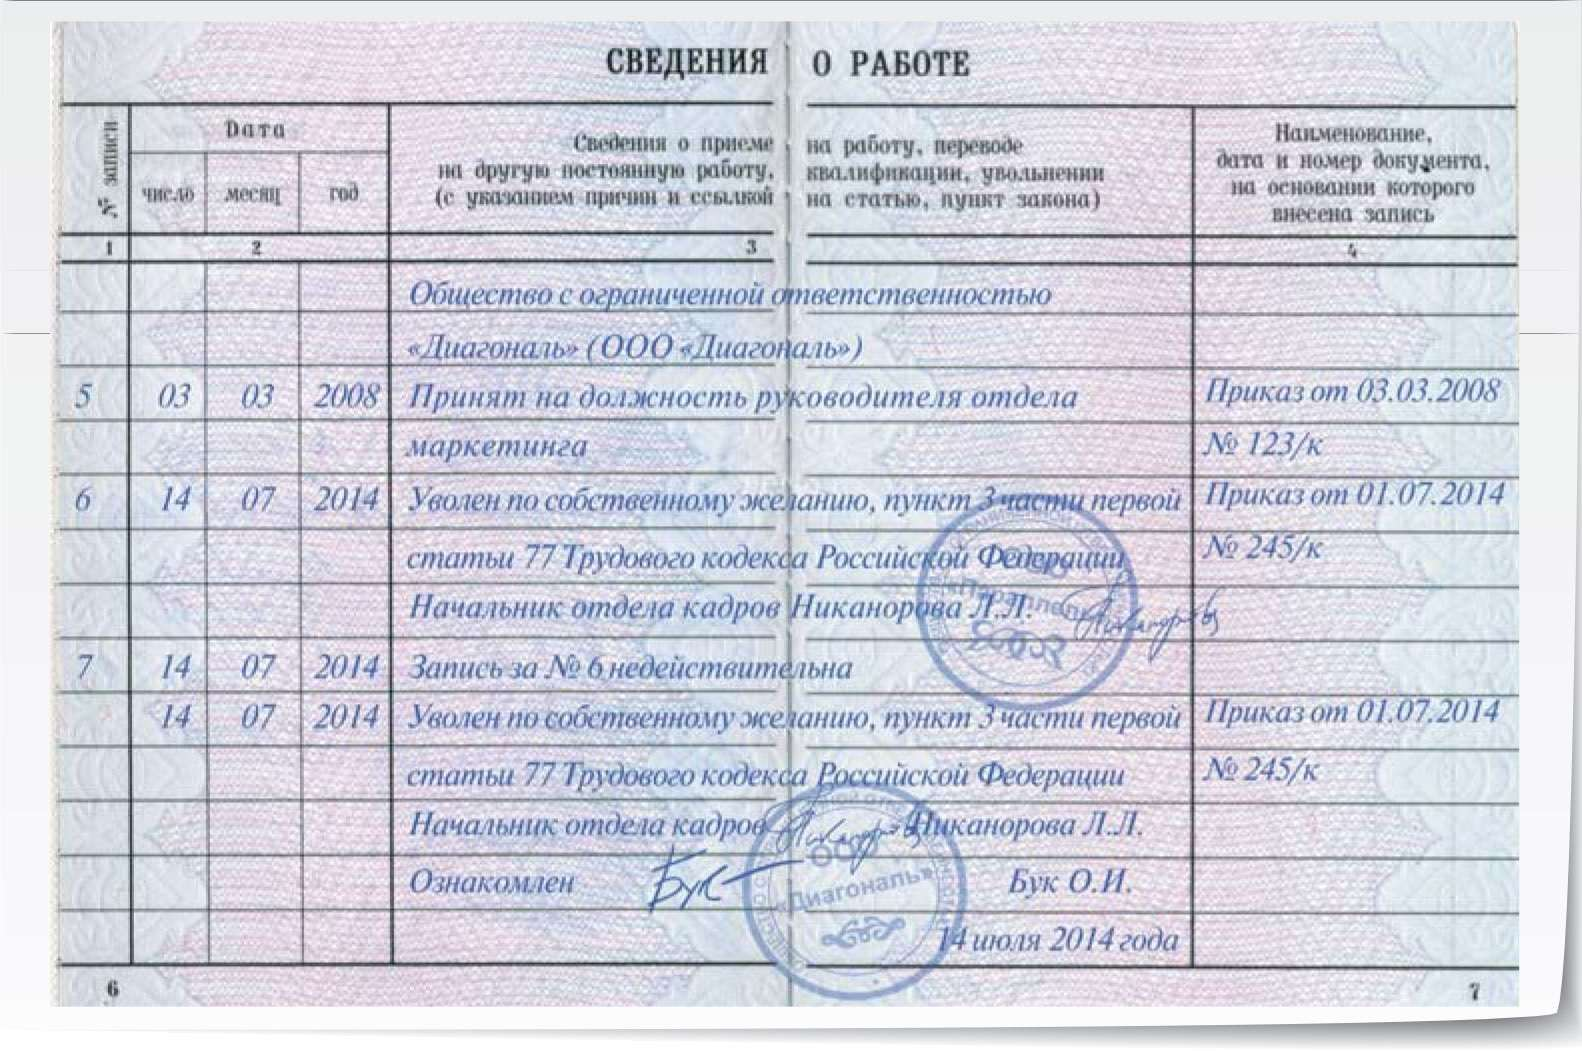 печати отдела кадров образец